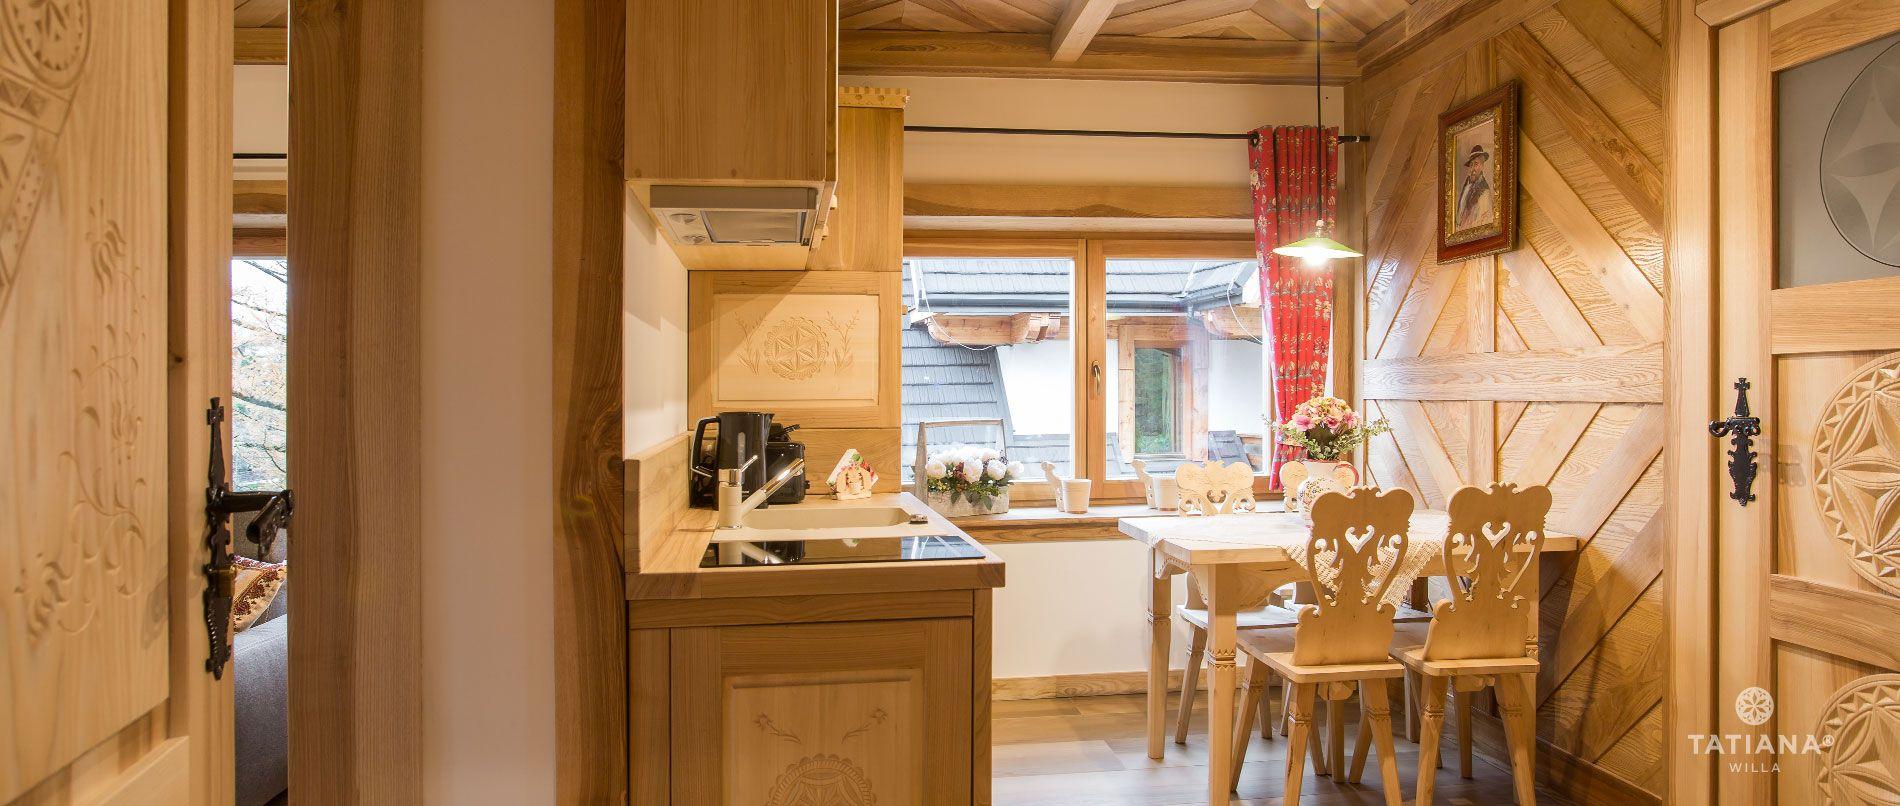 Apartament Tatrzański - kuchnia